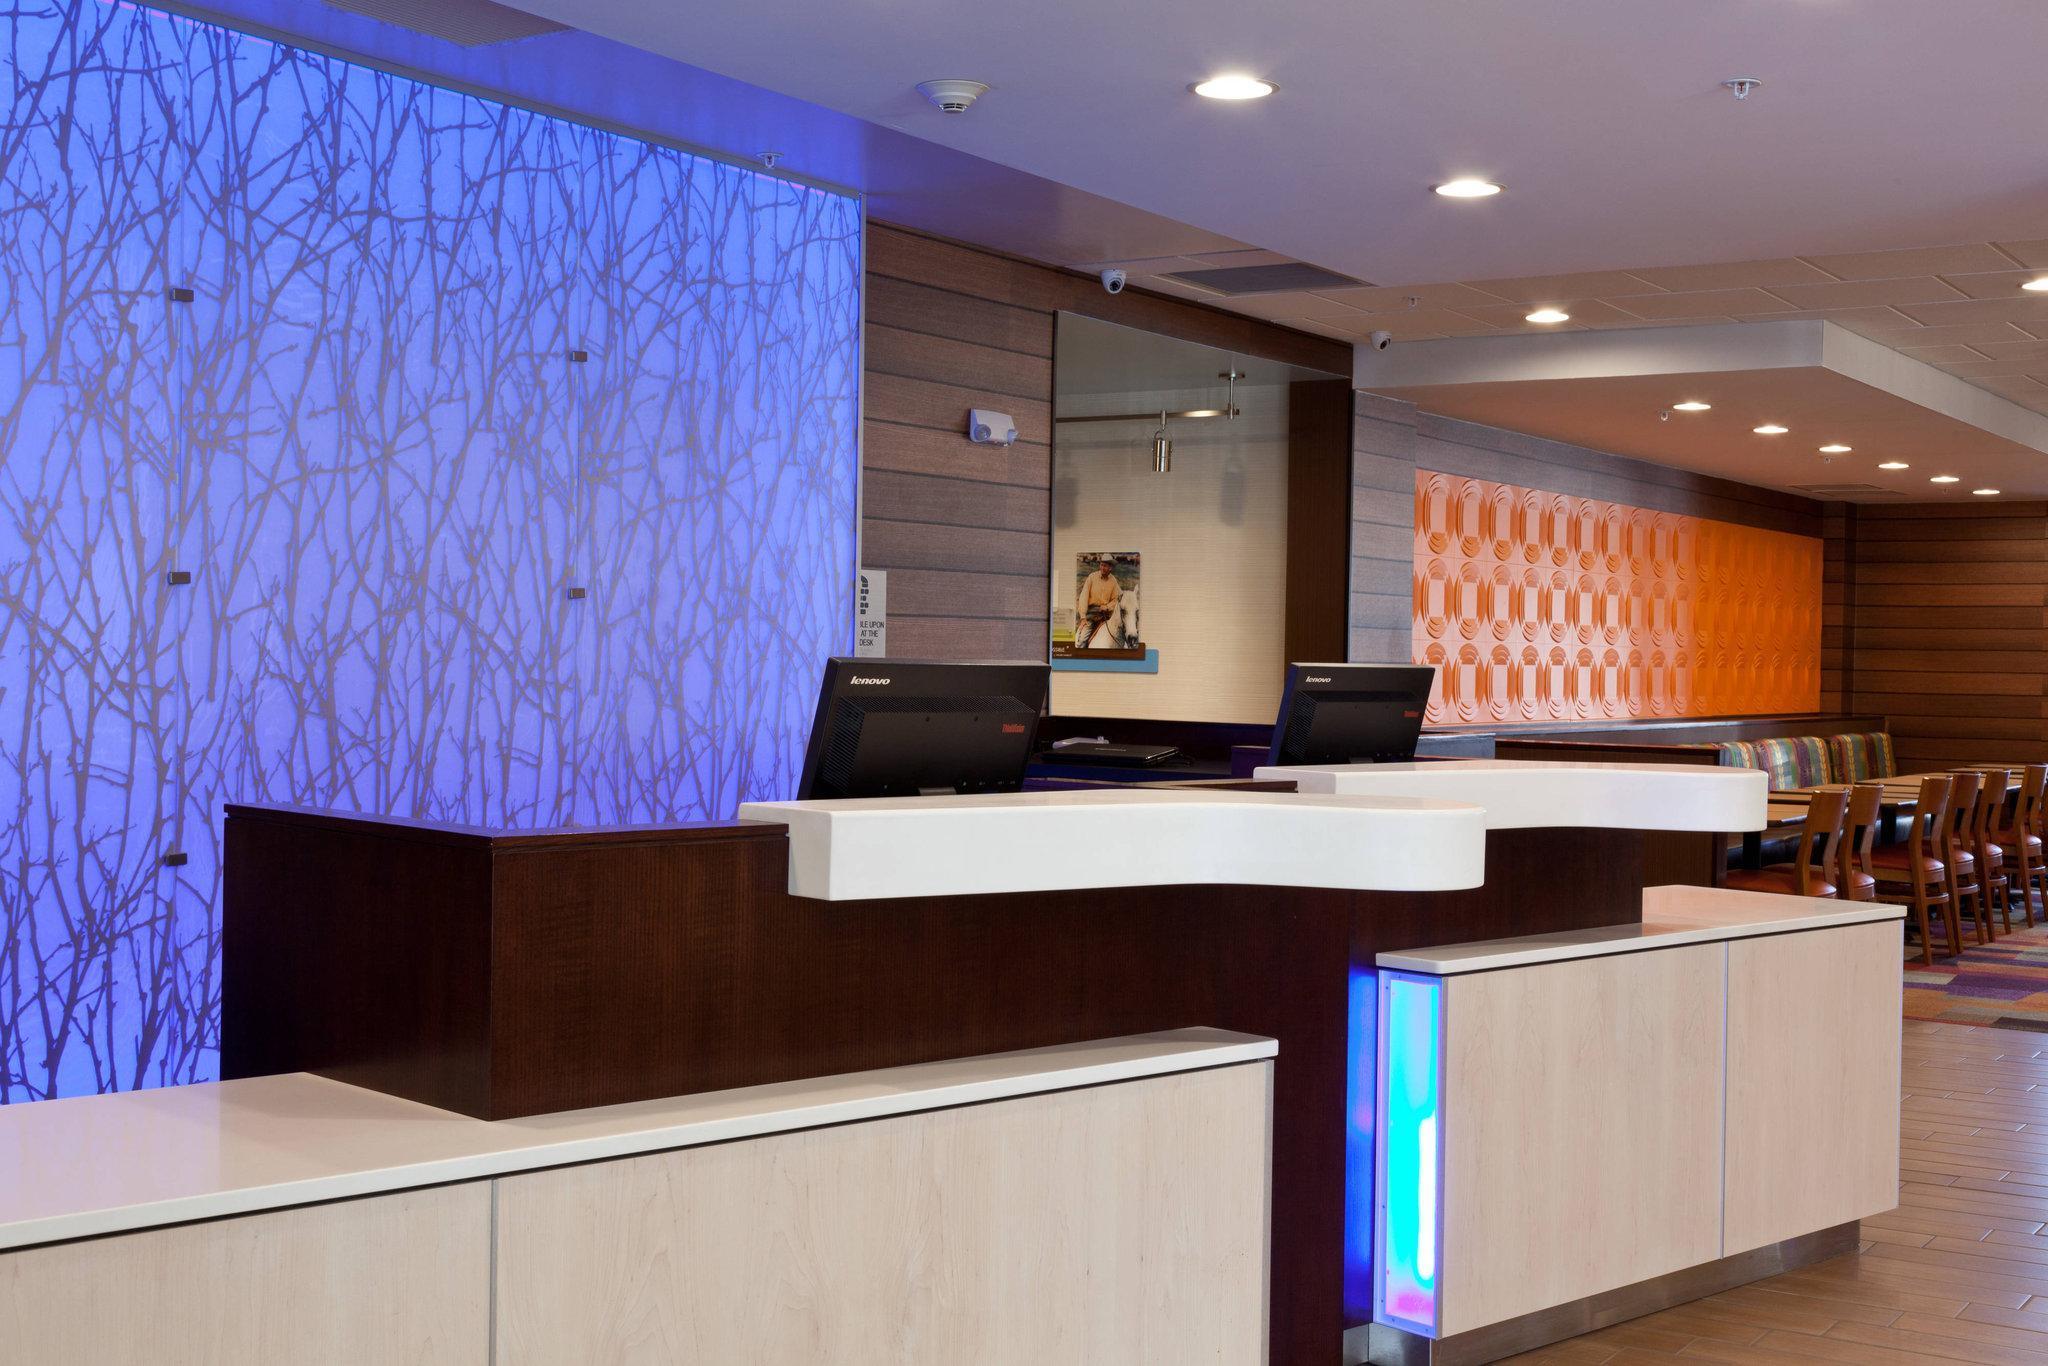 Fairfield Inn And Suites Ithaca